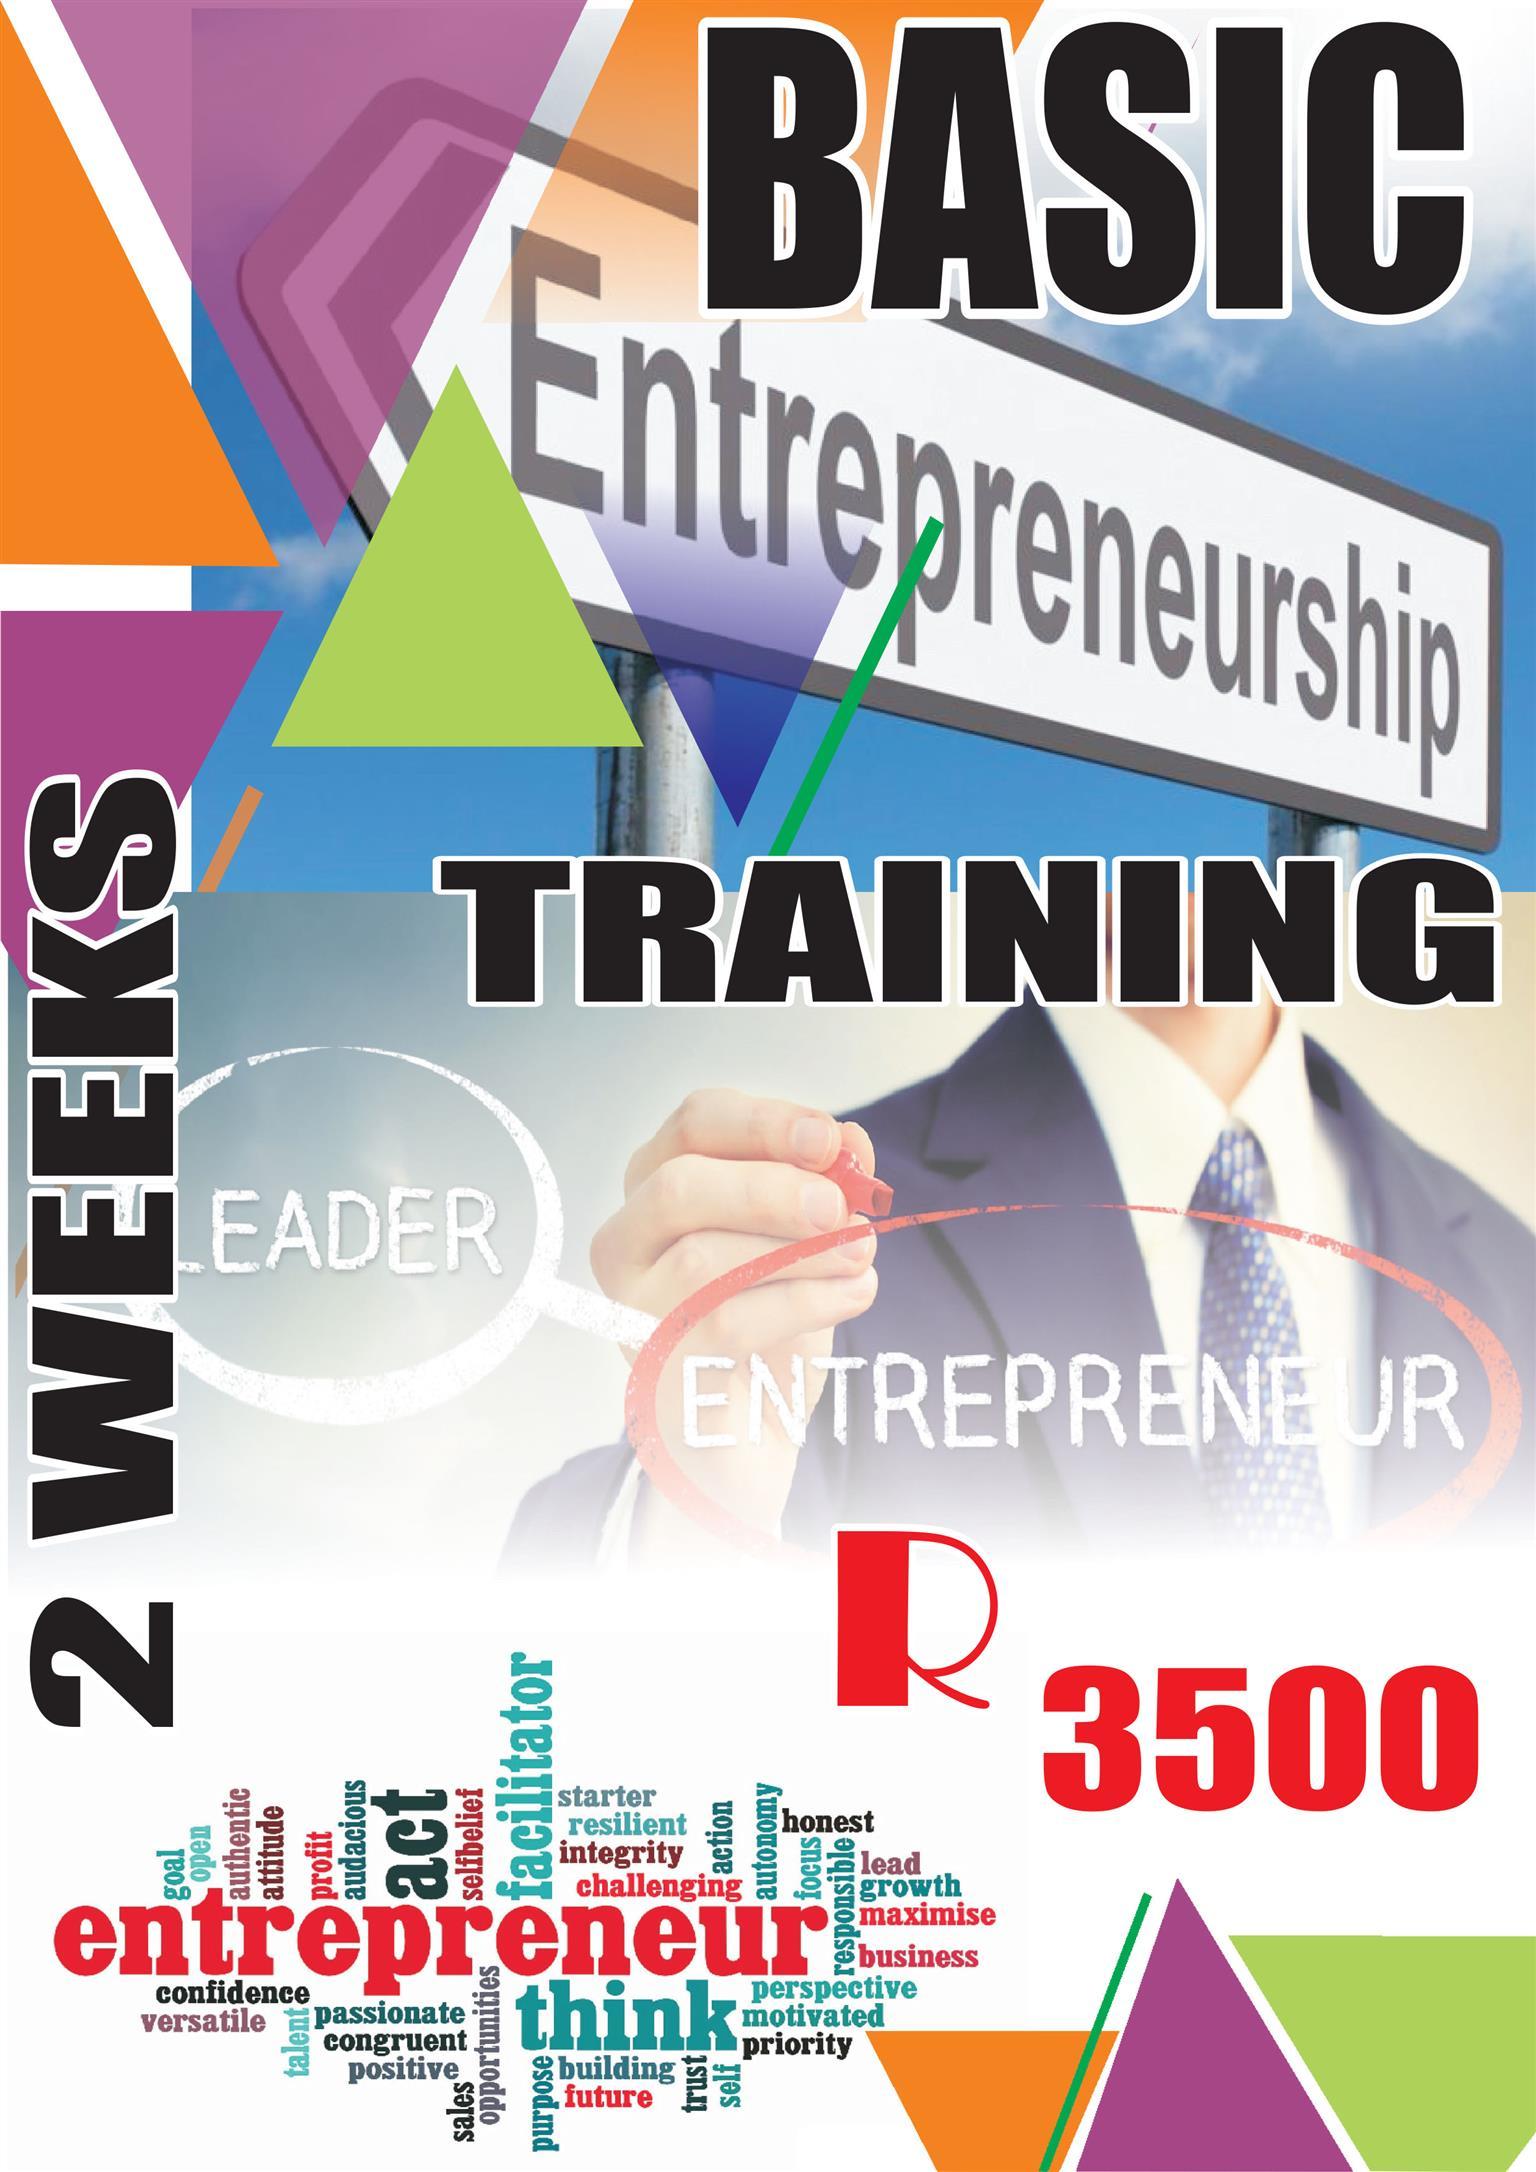 Basic Entrepreneurship workshop